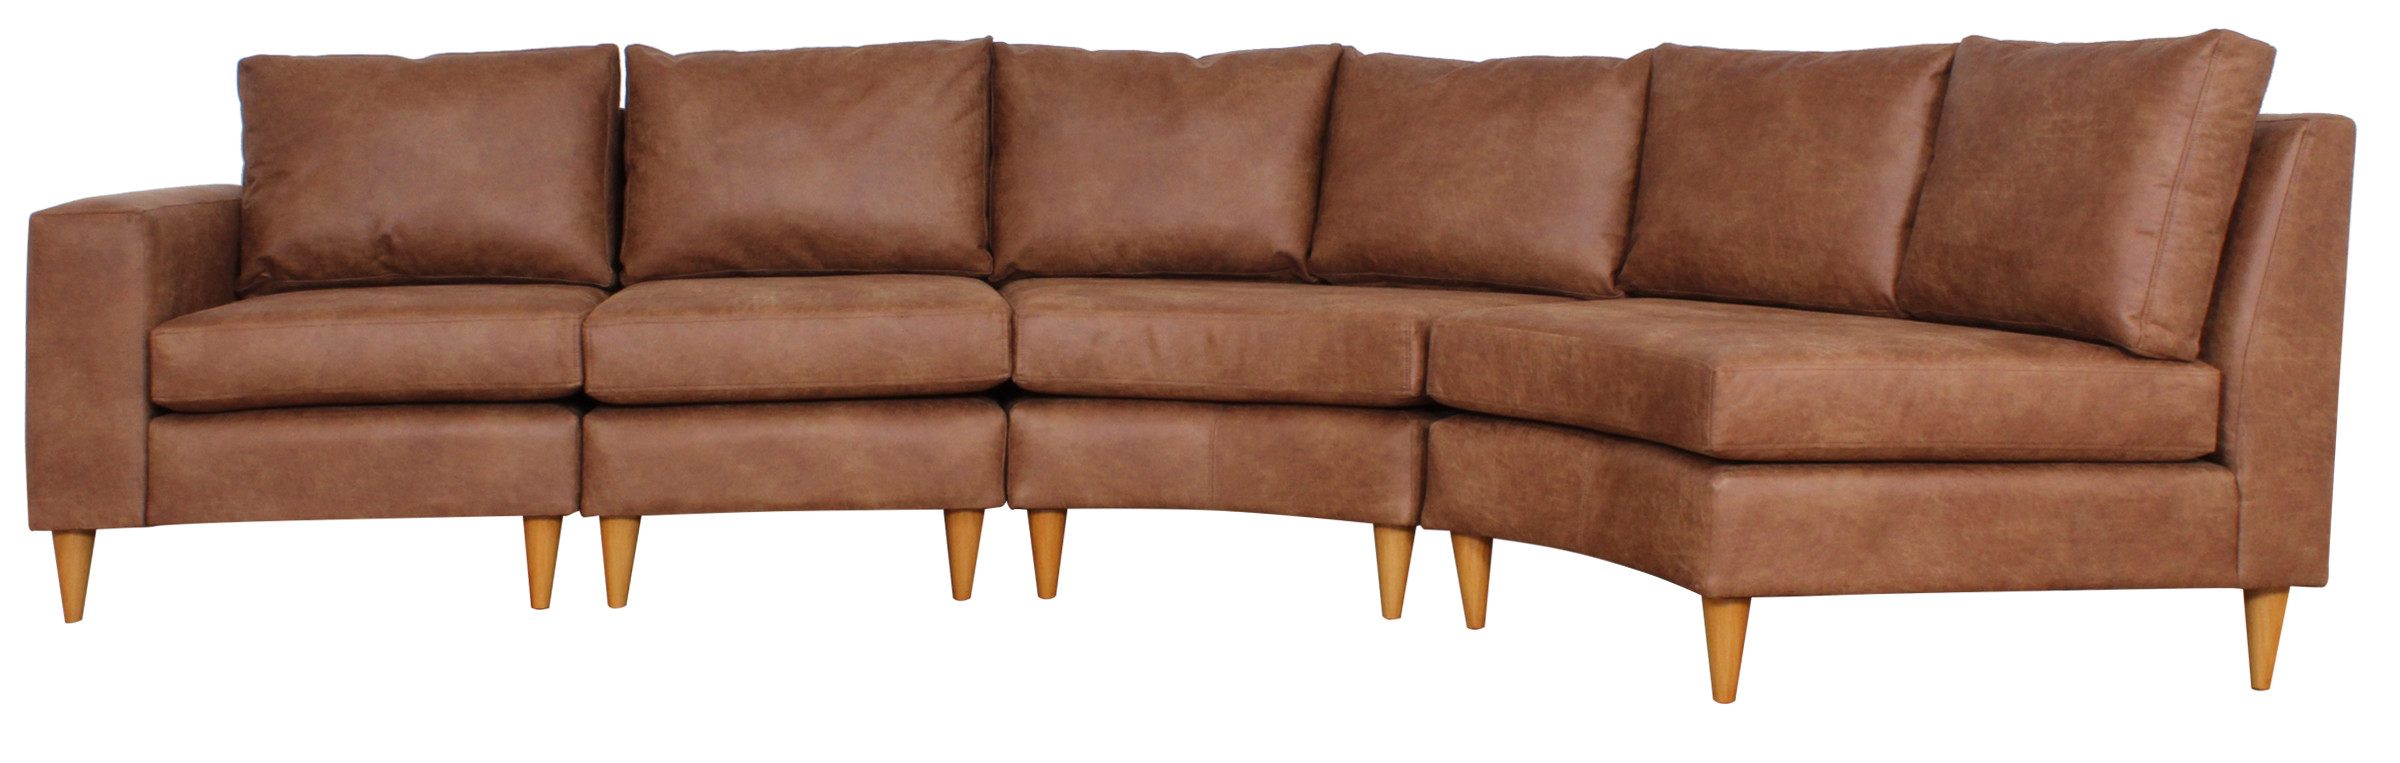 Sofa Curvo Bonded 70 22